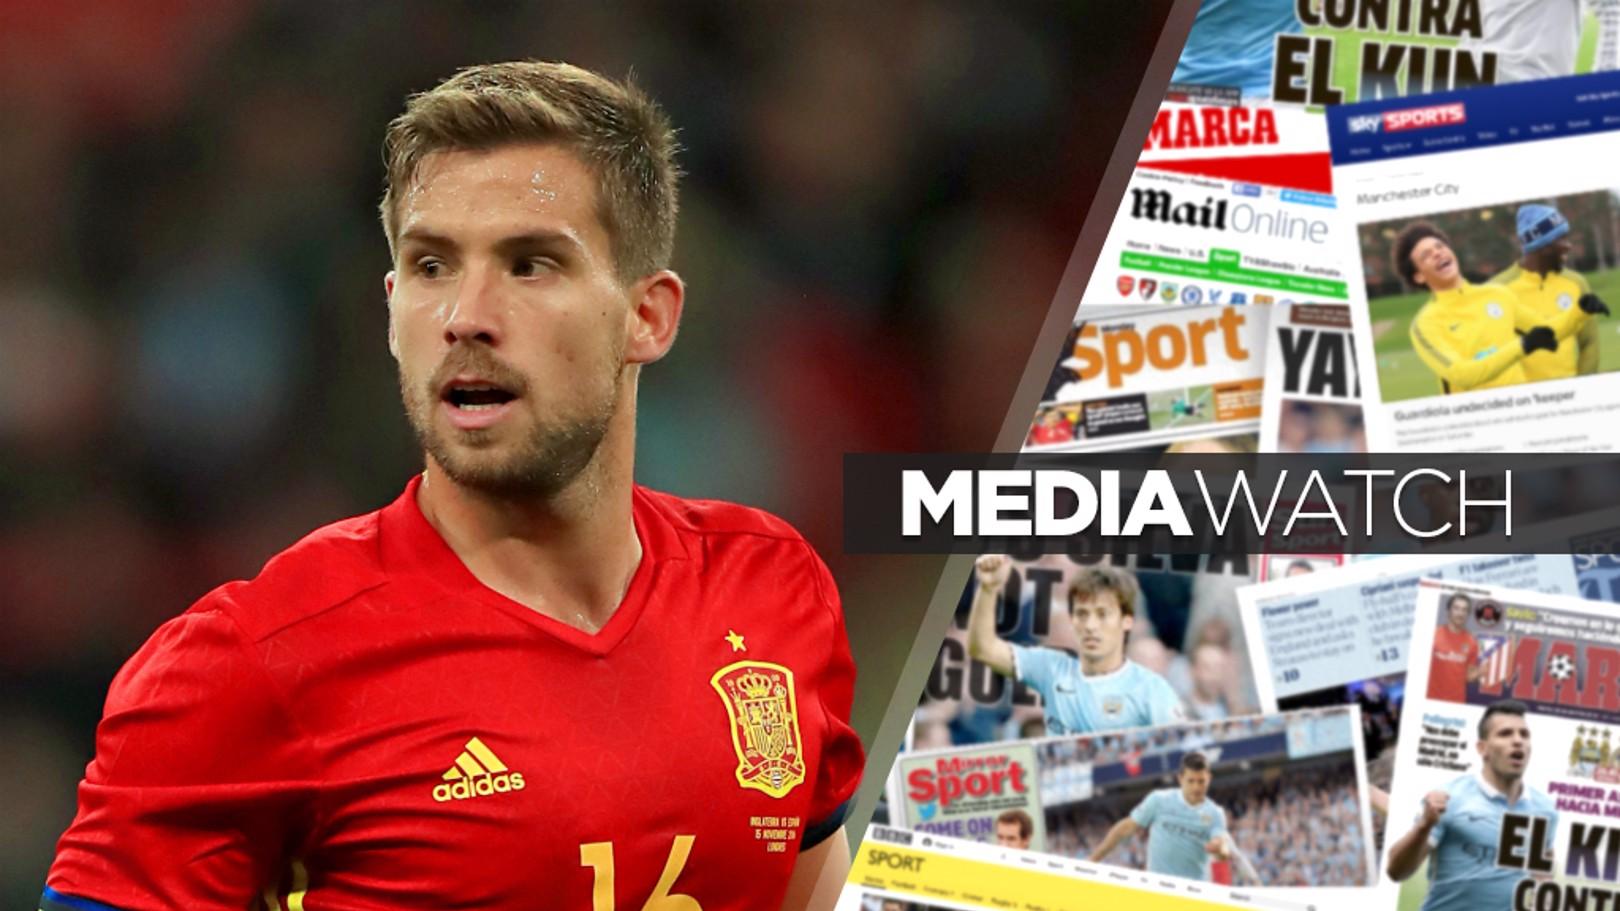 MEDIA WATCH: It's claimed City are keen on Spanish defender Inigo Martinez